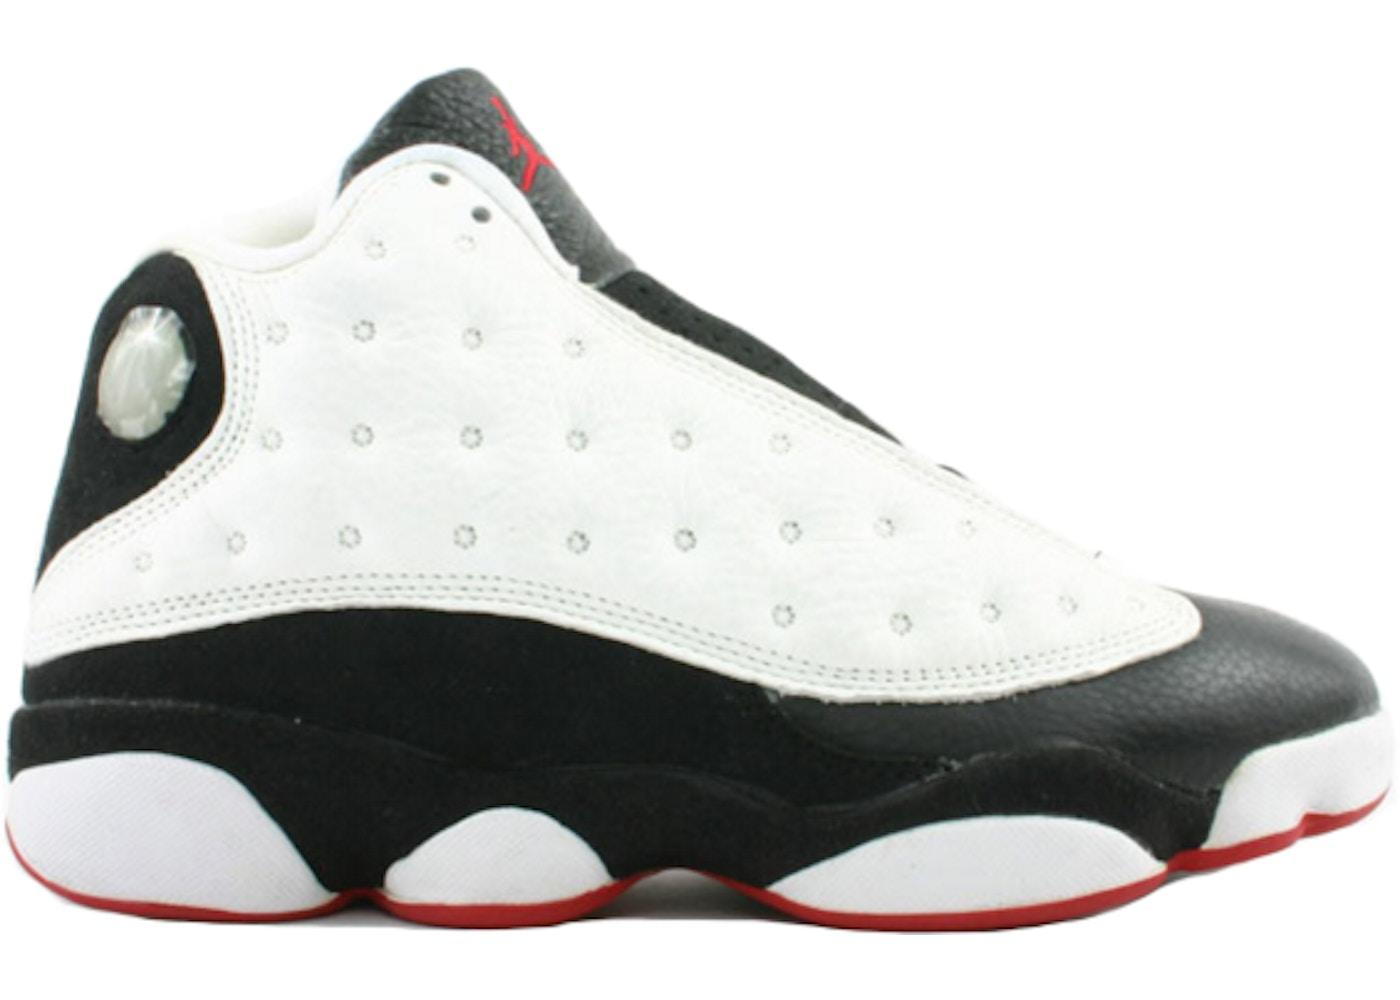 size 40 c1d38 3a614 Jordan 13 OG He Got Game (1997)